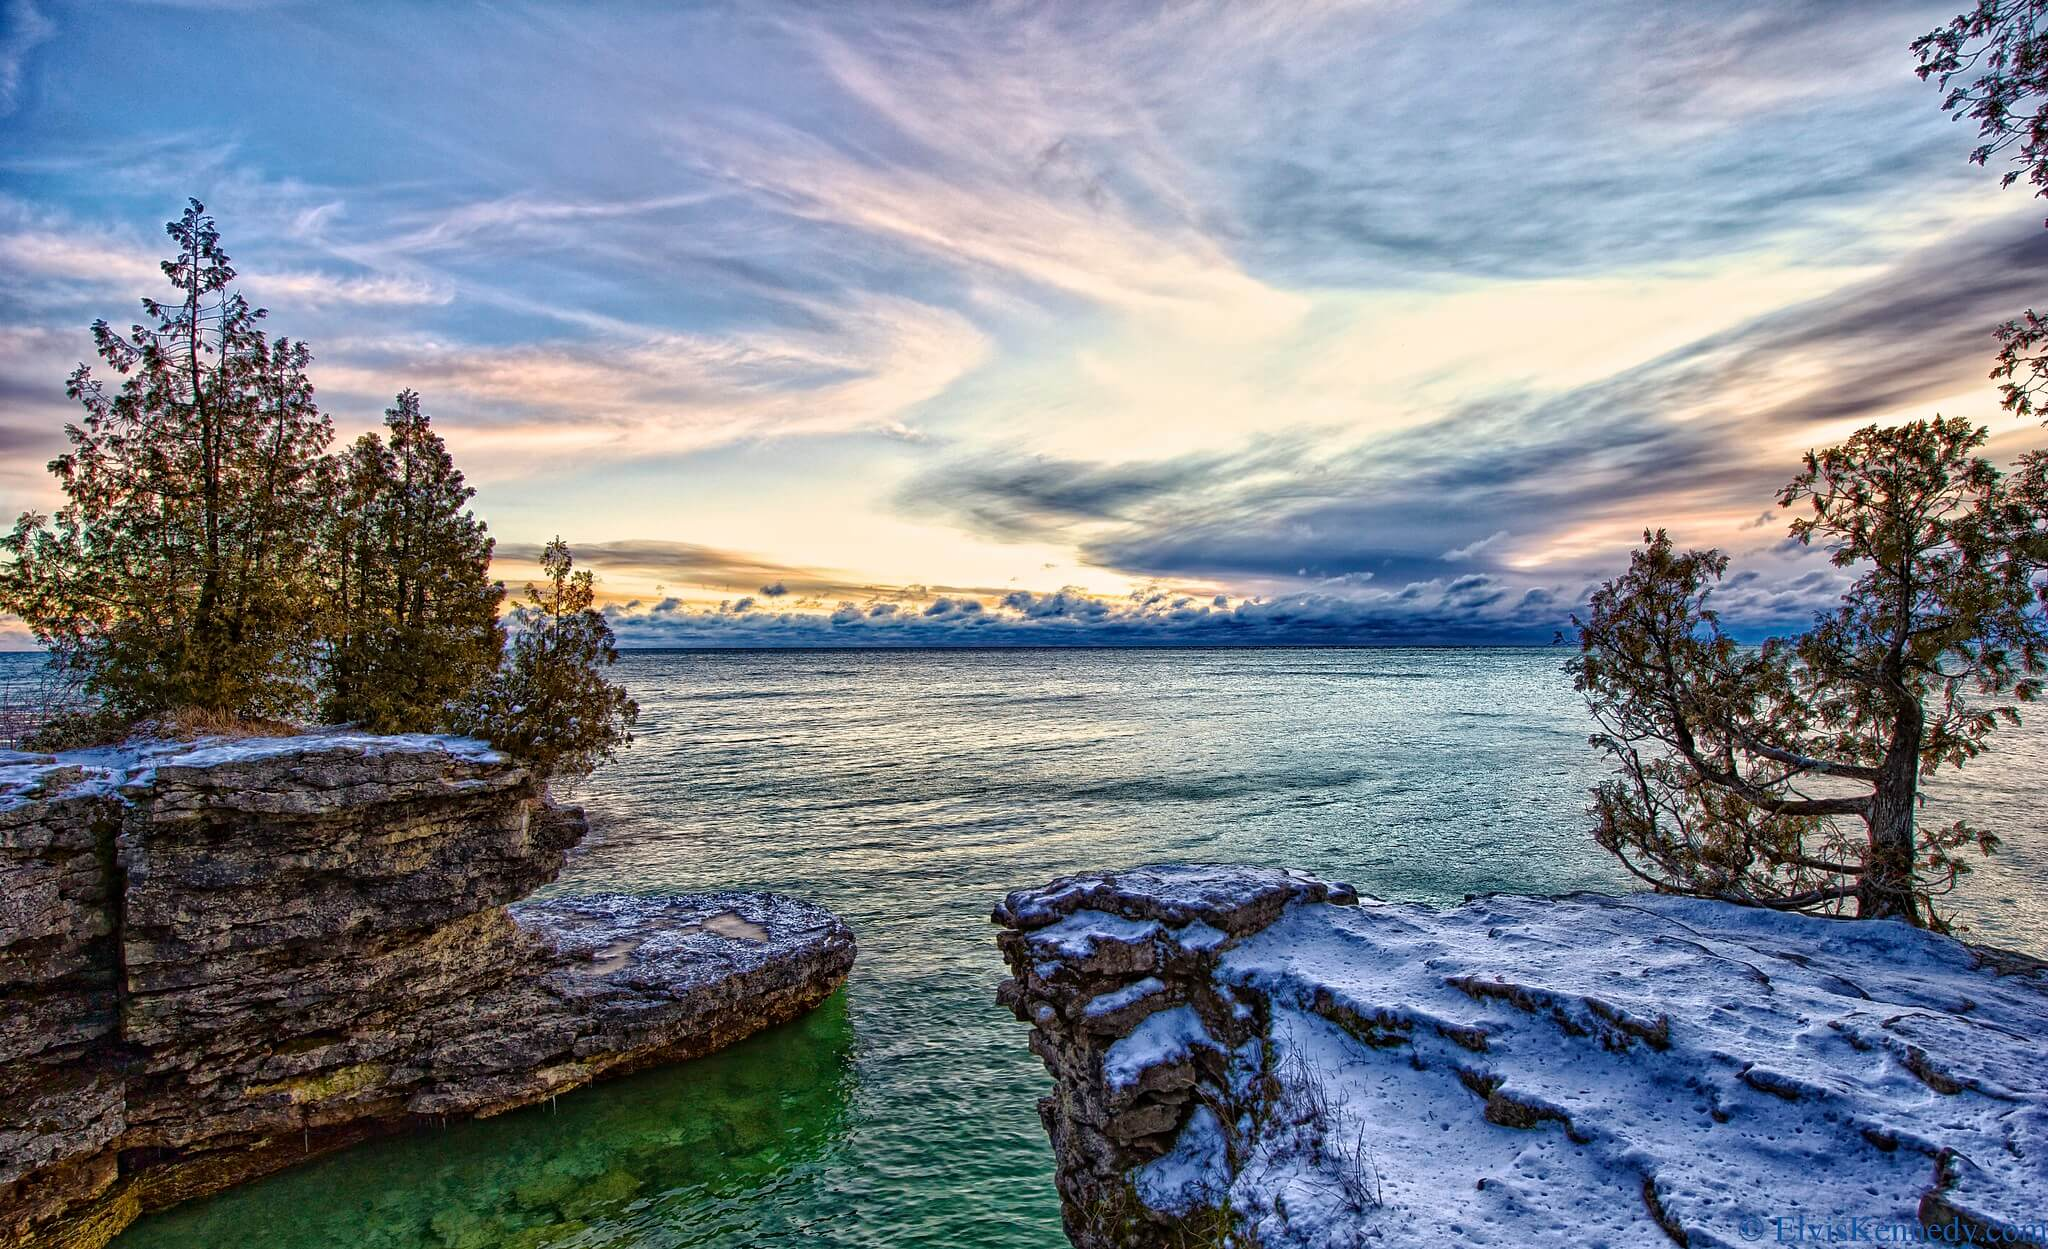 Winter sunrise over Lake Michigan. Across Wisconsin, the Knowles-Nelson Stewardship Program has preserved similar vistas.